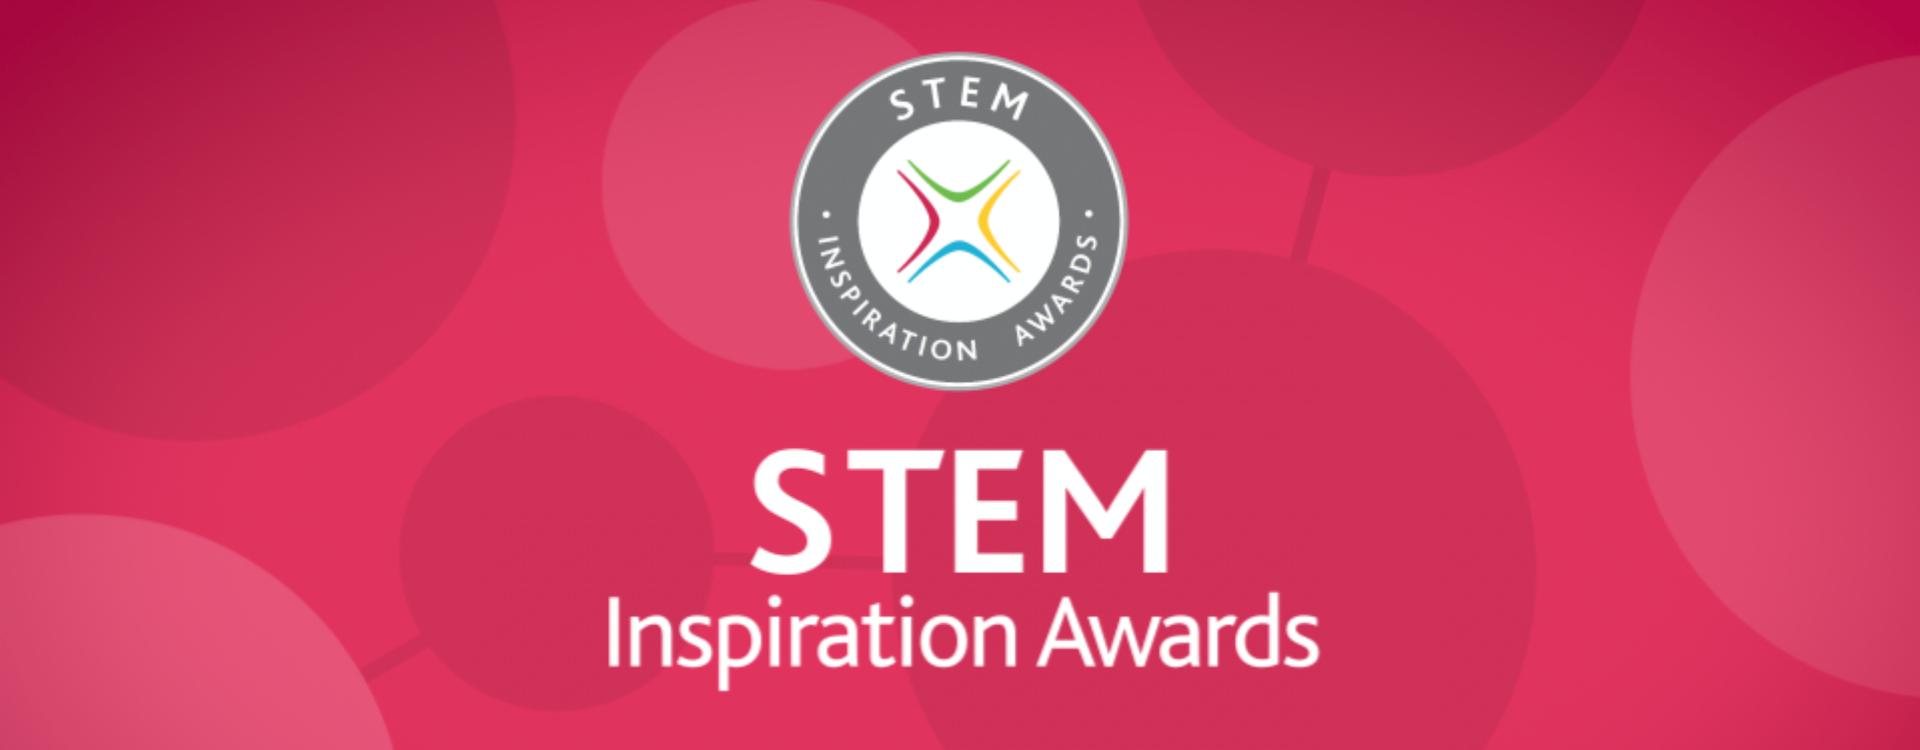 STEM Inspiration awards – banner